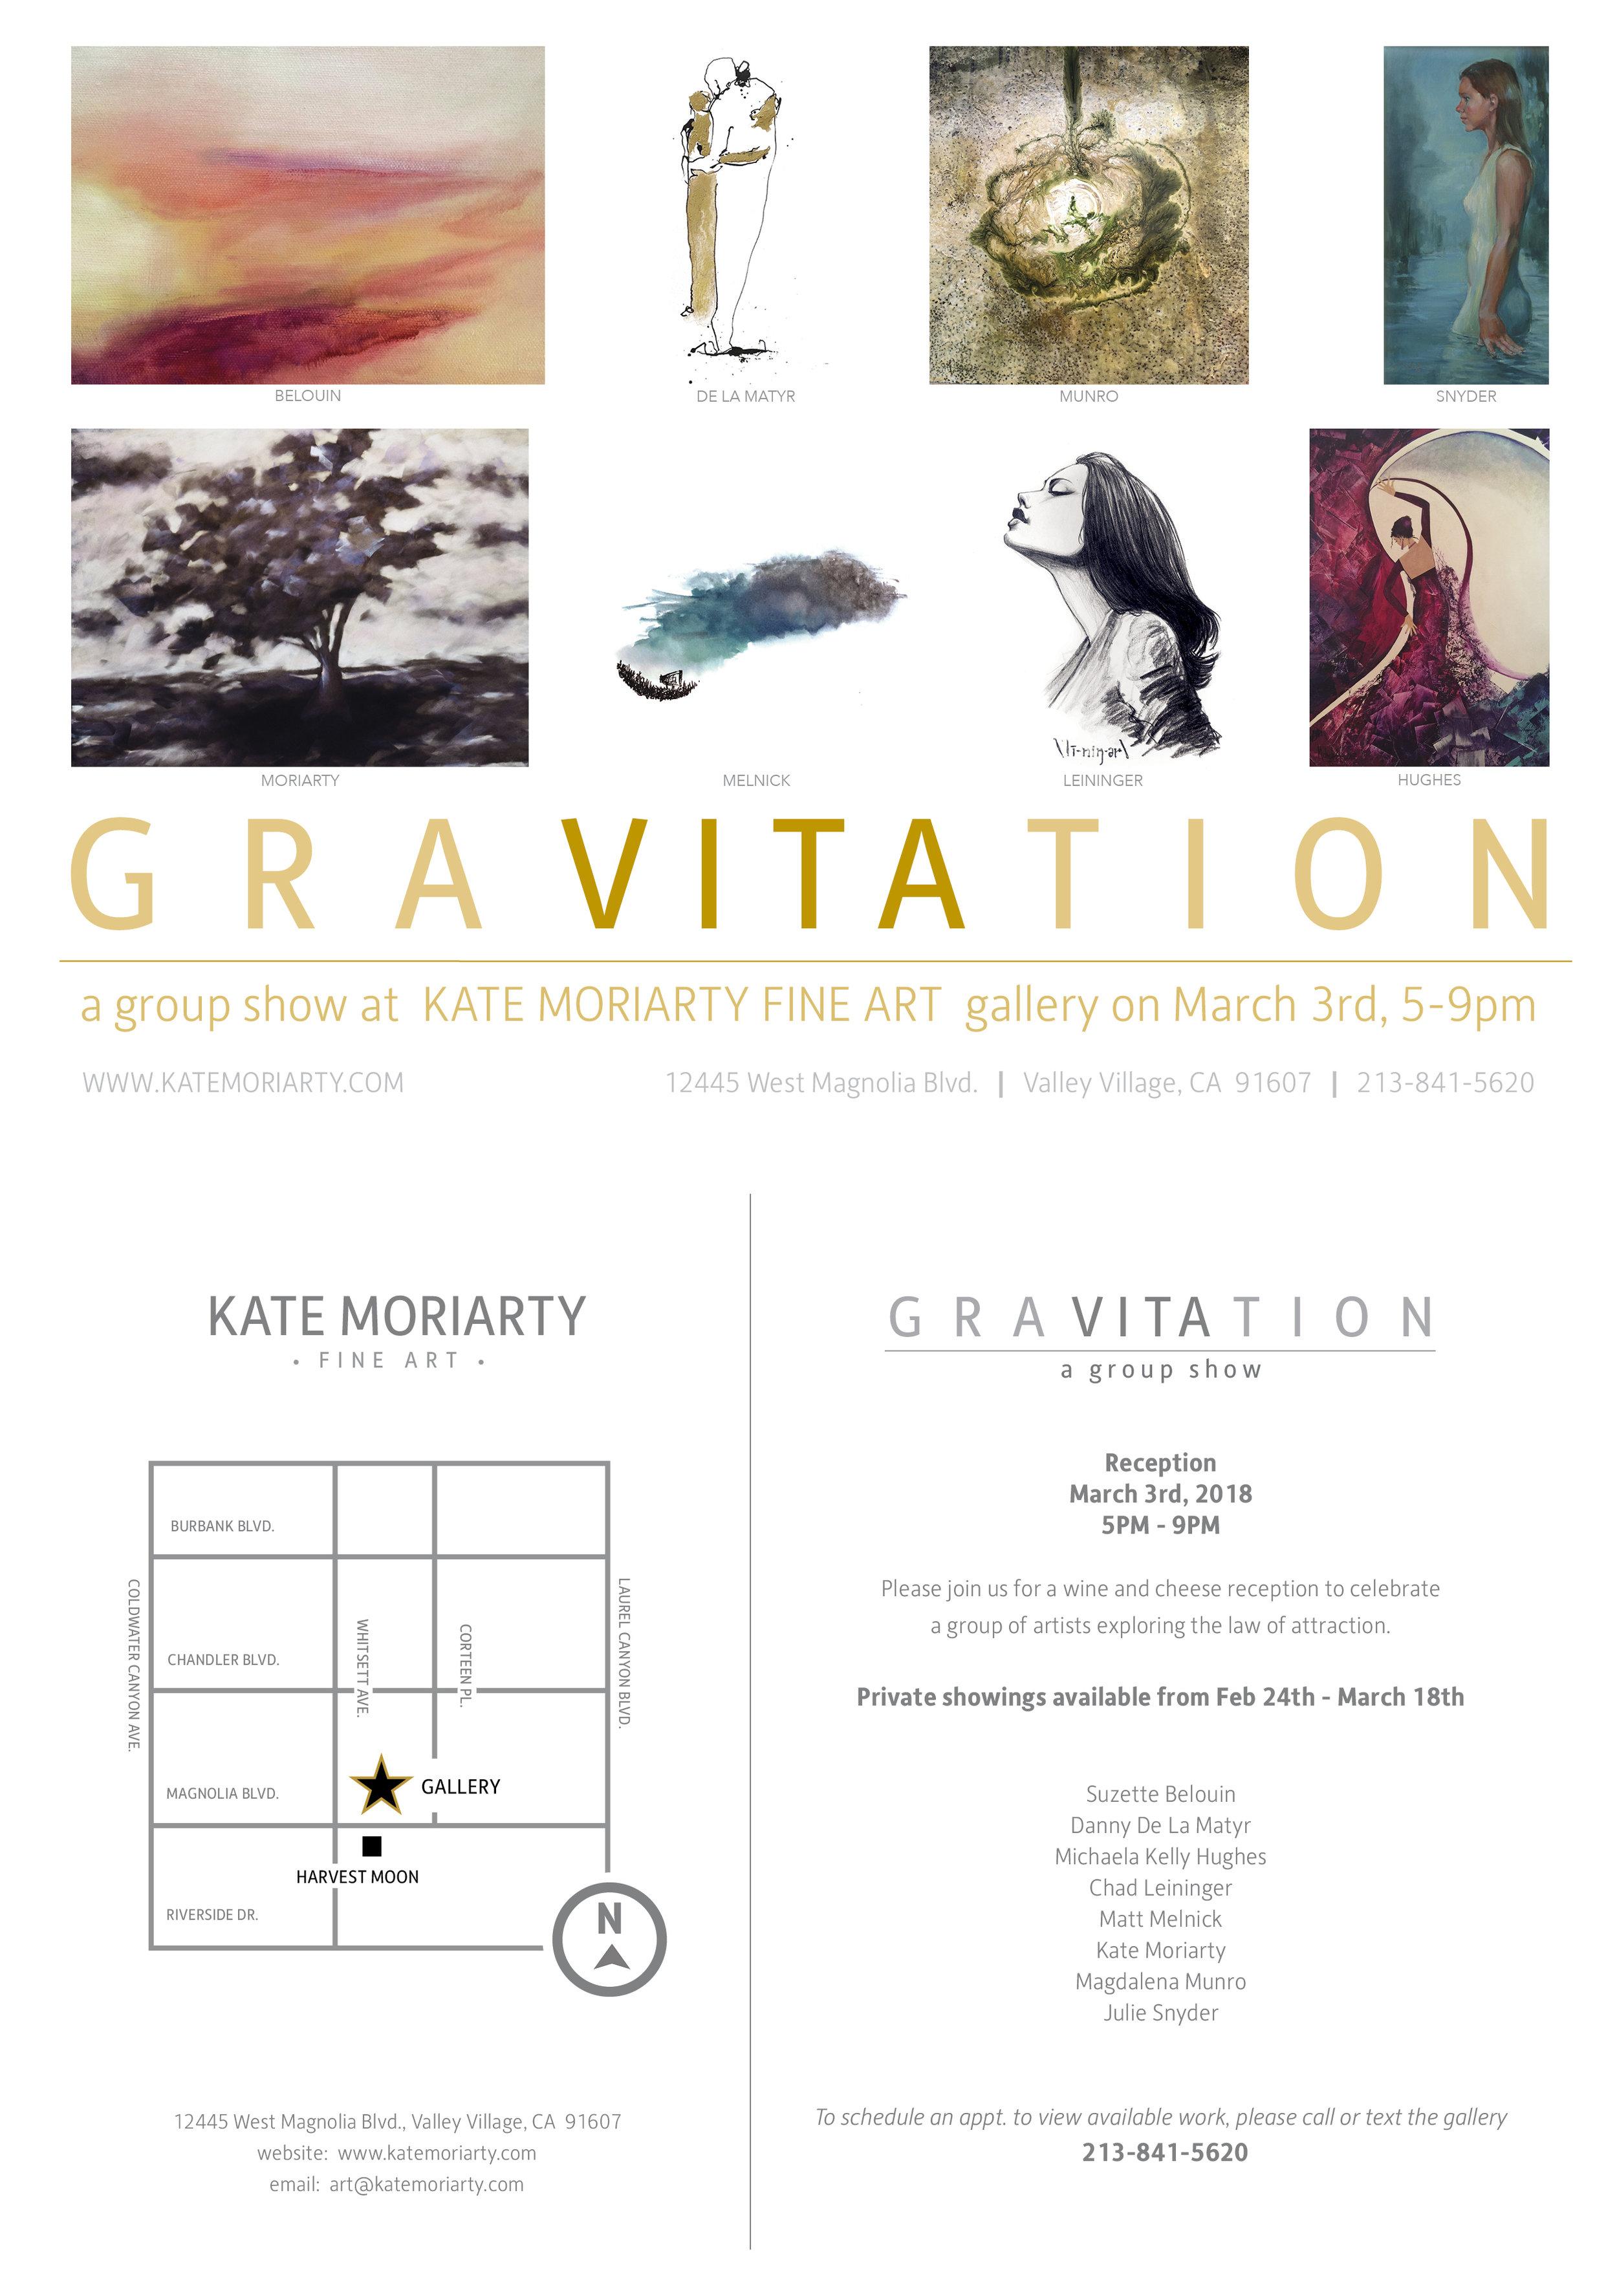 gravitation_promo.jpg